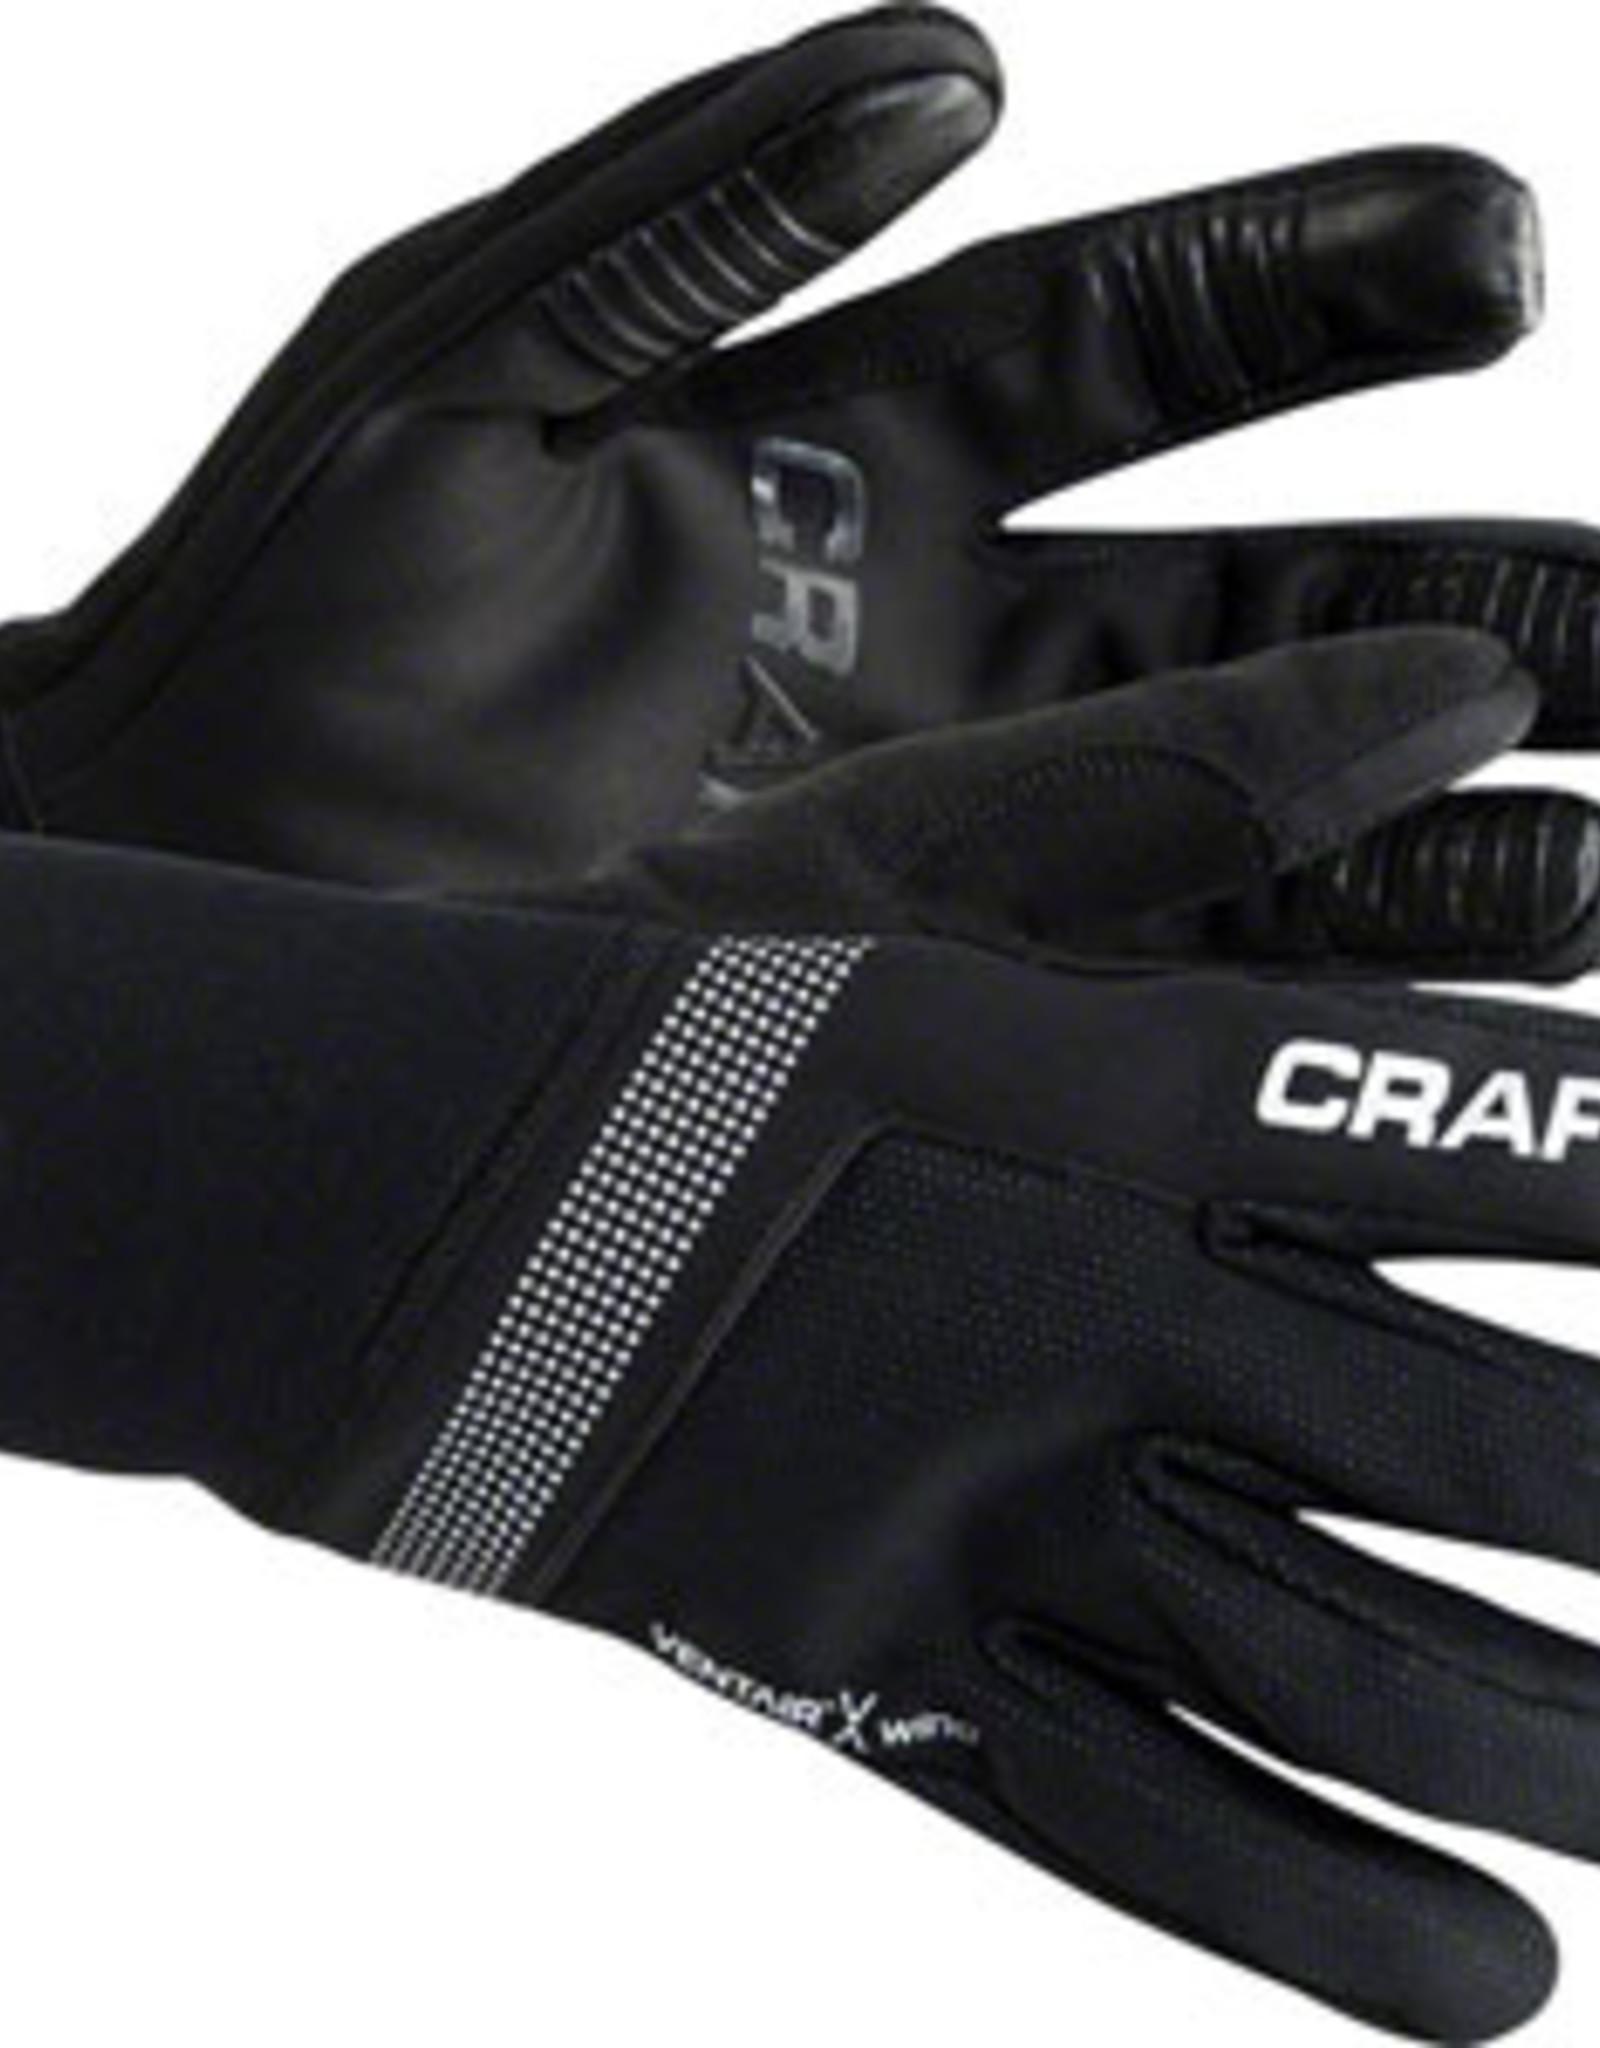 Craft Shelter Glove, Black Small